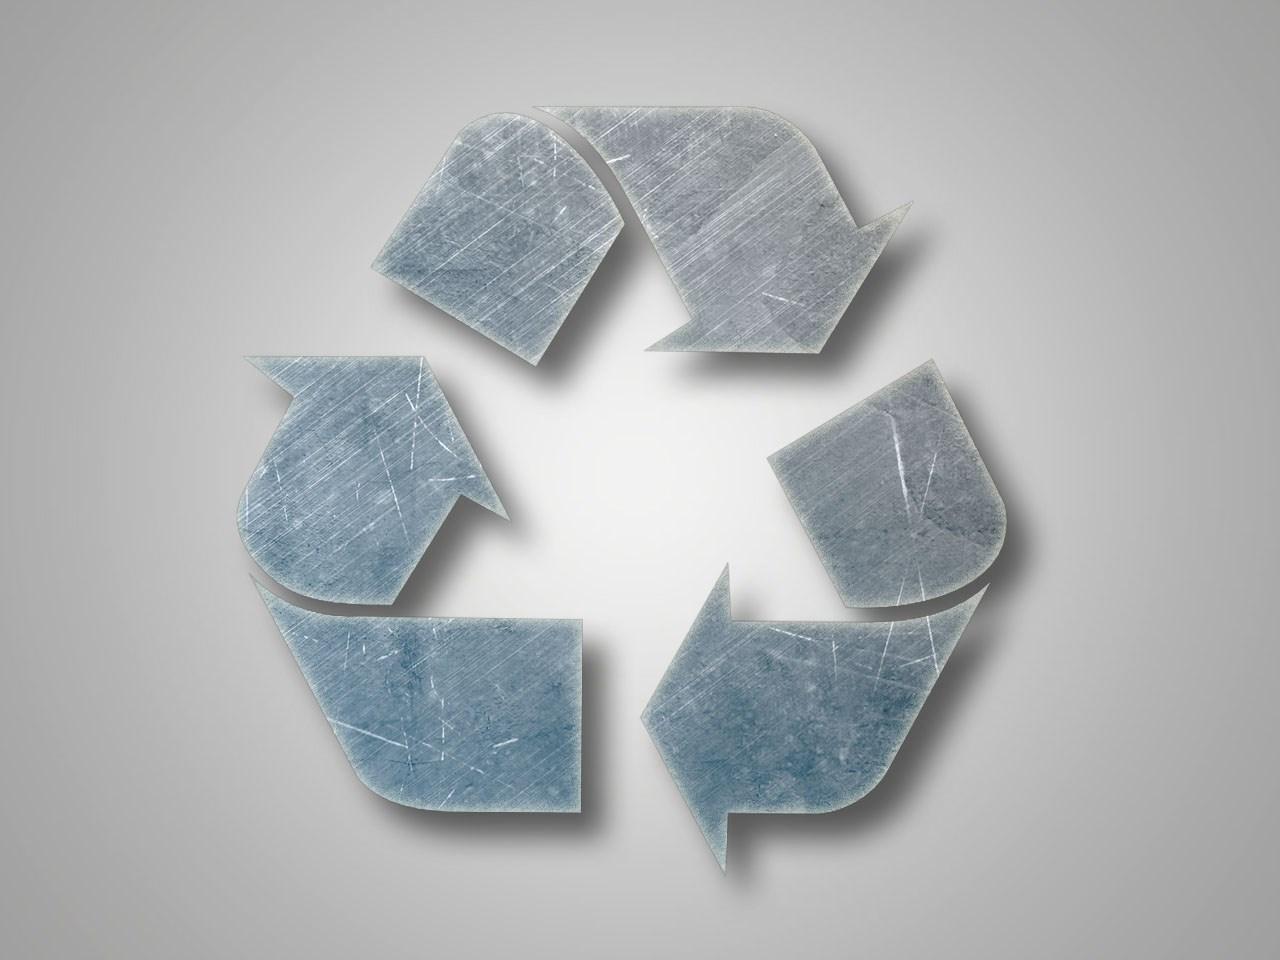 RecyclingSymbol_143155